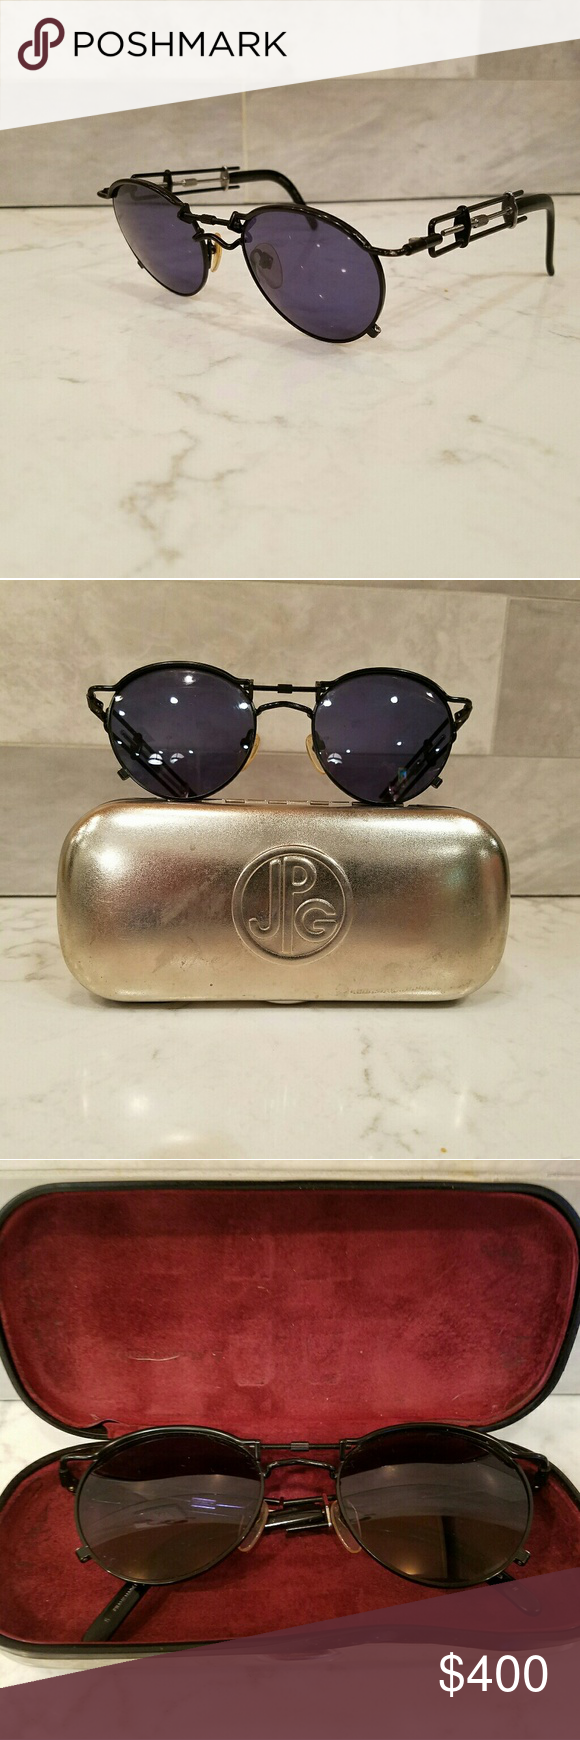 Sunglasses Vintage used Jean Paul Gaultier Accessories Sunglasses